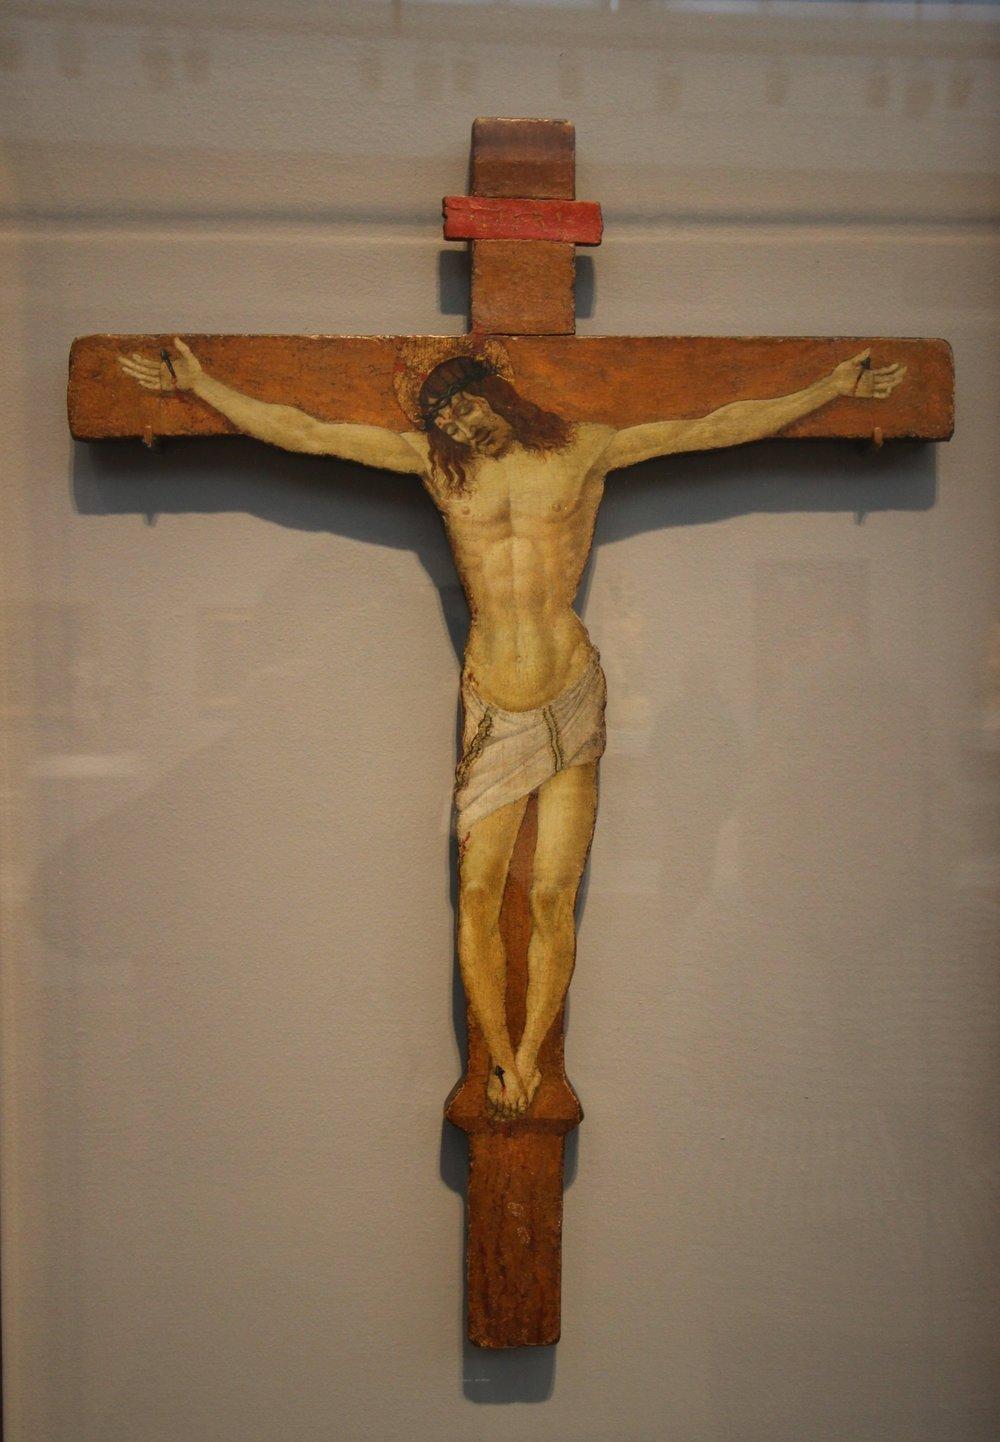 Sandro Botticelli, Christ on the Cross, ca. 1500, Tempera on wood